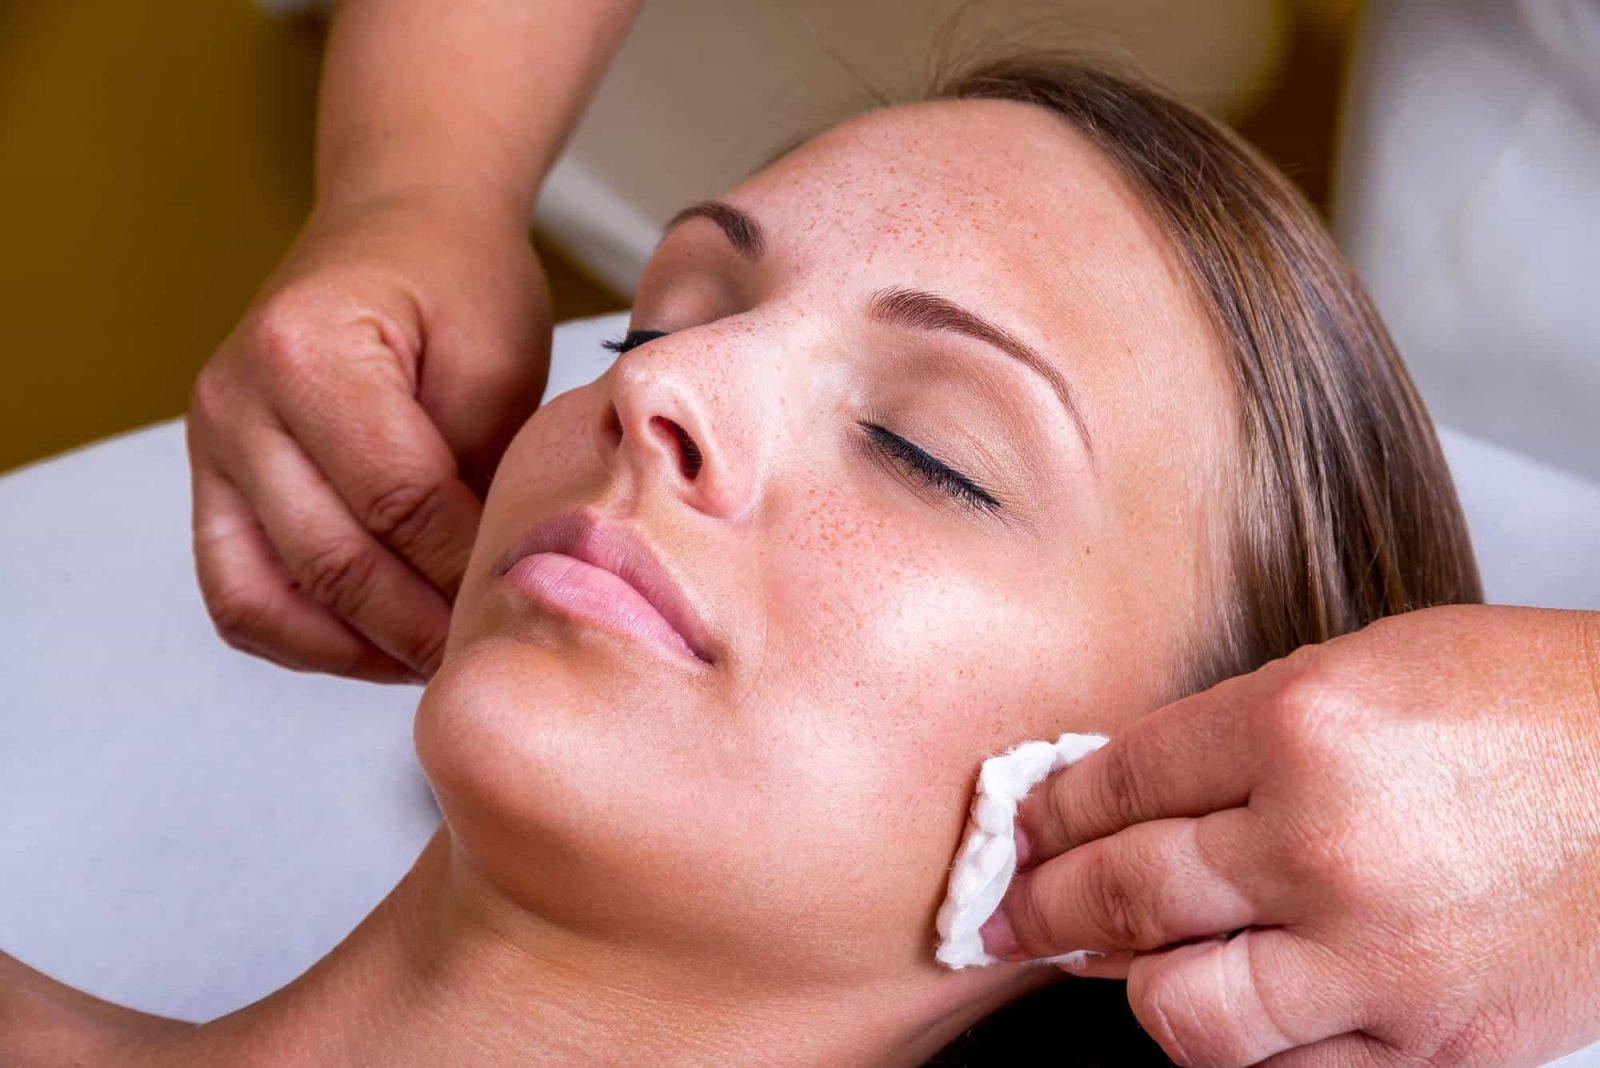 chemical-peels-glasgow - woman undergoing treatment